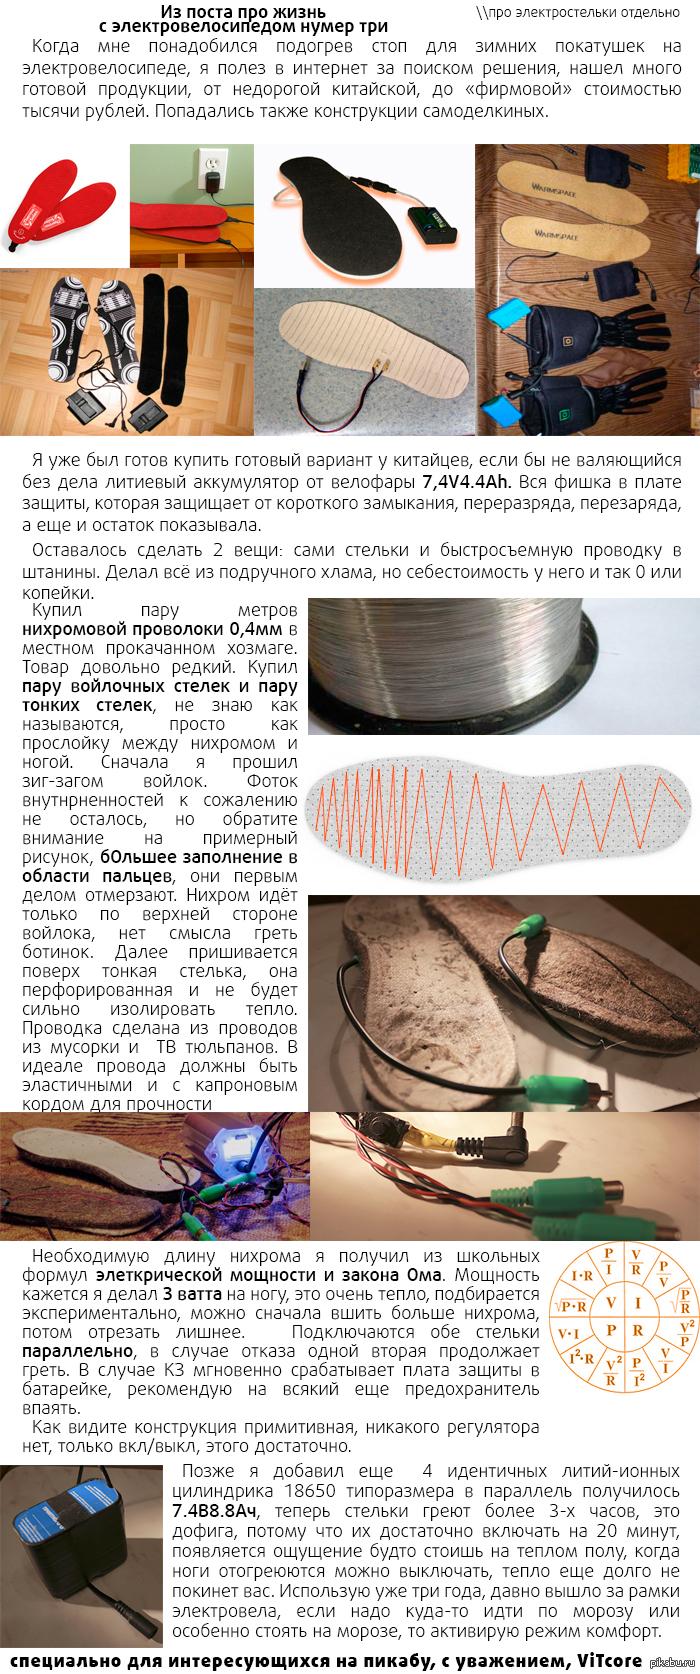 "про электростельки дополнение к посту <a href=""http://pikabu.ru/story/_1757368"">http://pikabu.ru/story/_1757368</a>"